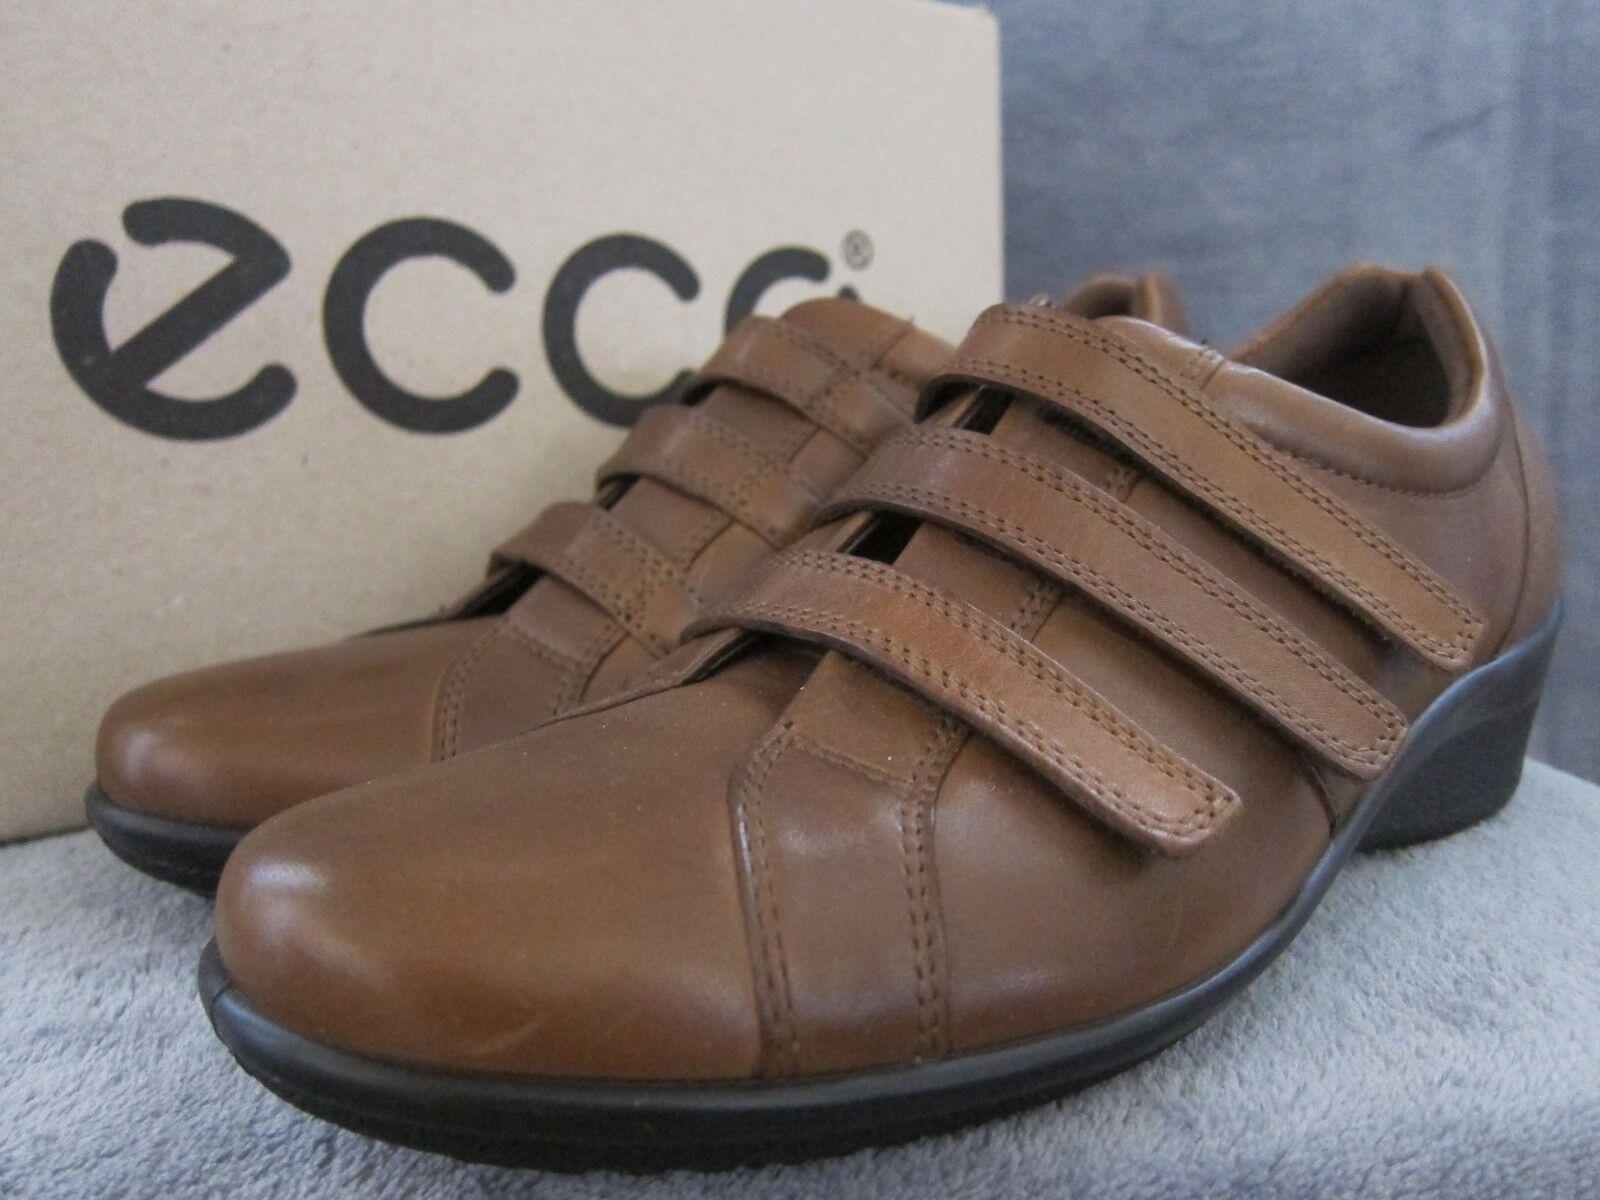 ECCO Womens Corse 3 Strap Walnut Leather Comfort shoes US 8 - 8.5 EUR 39 NWB